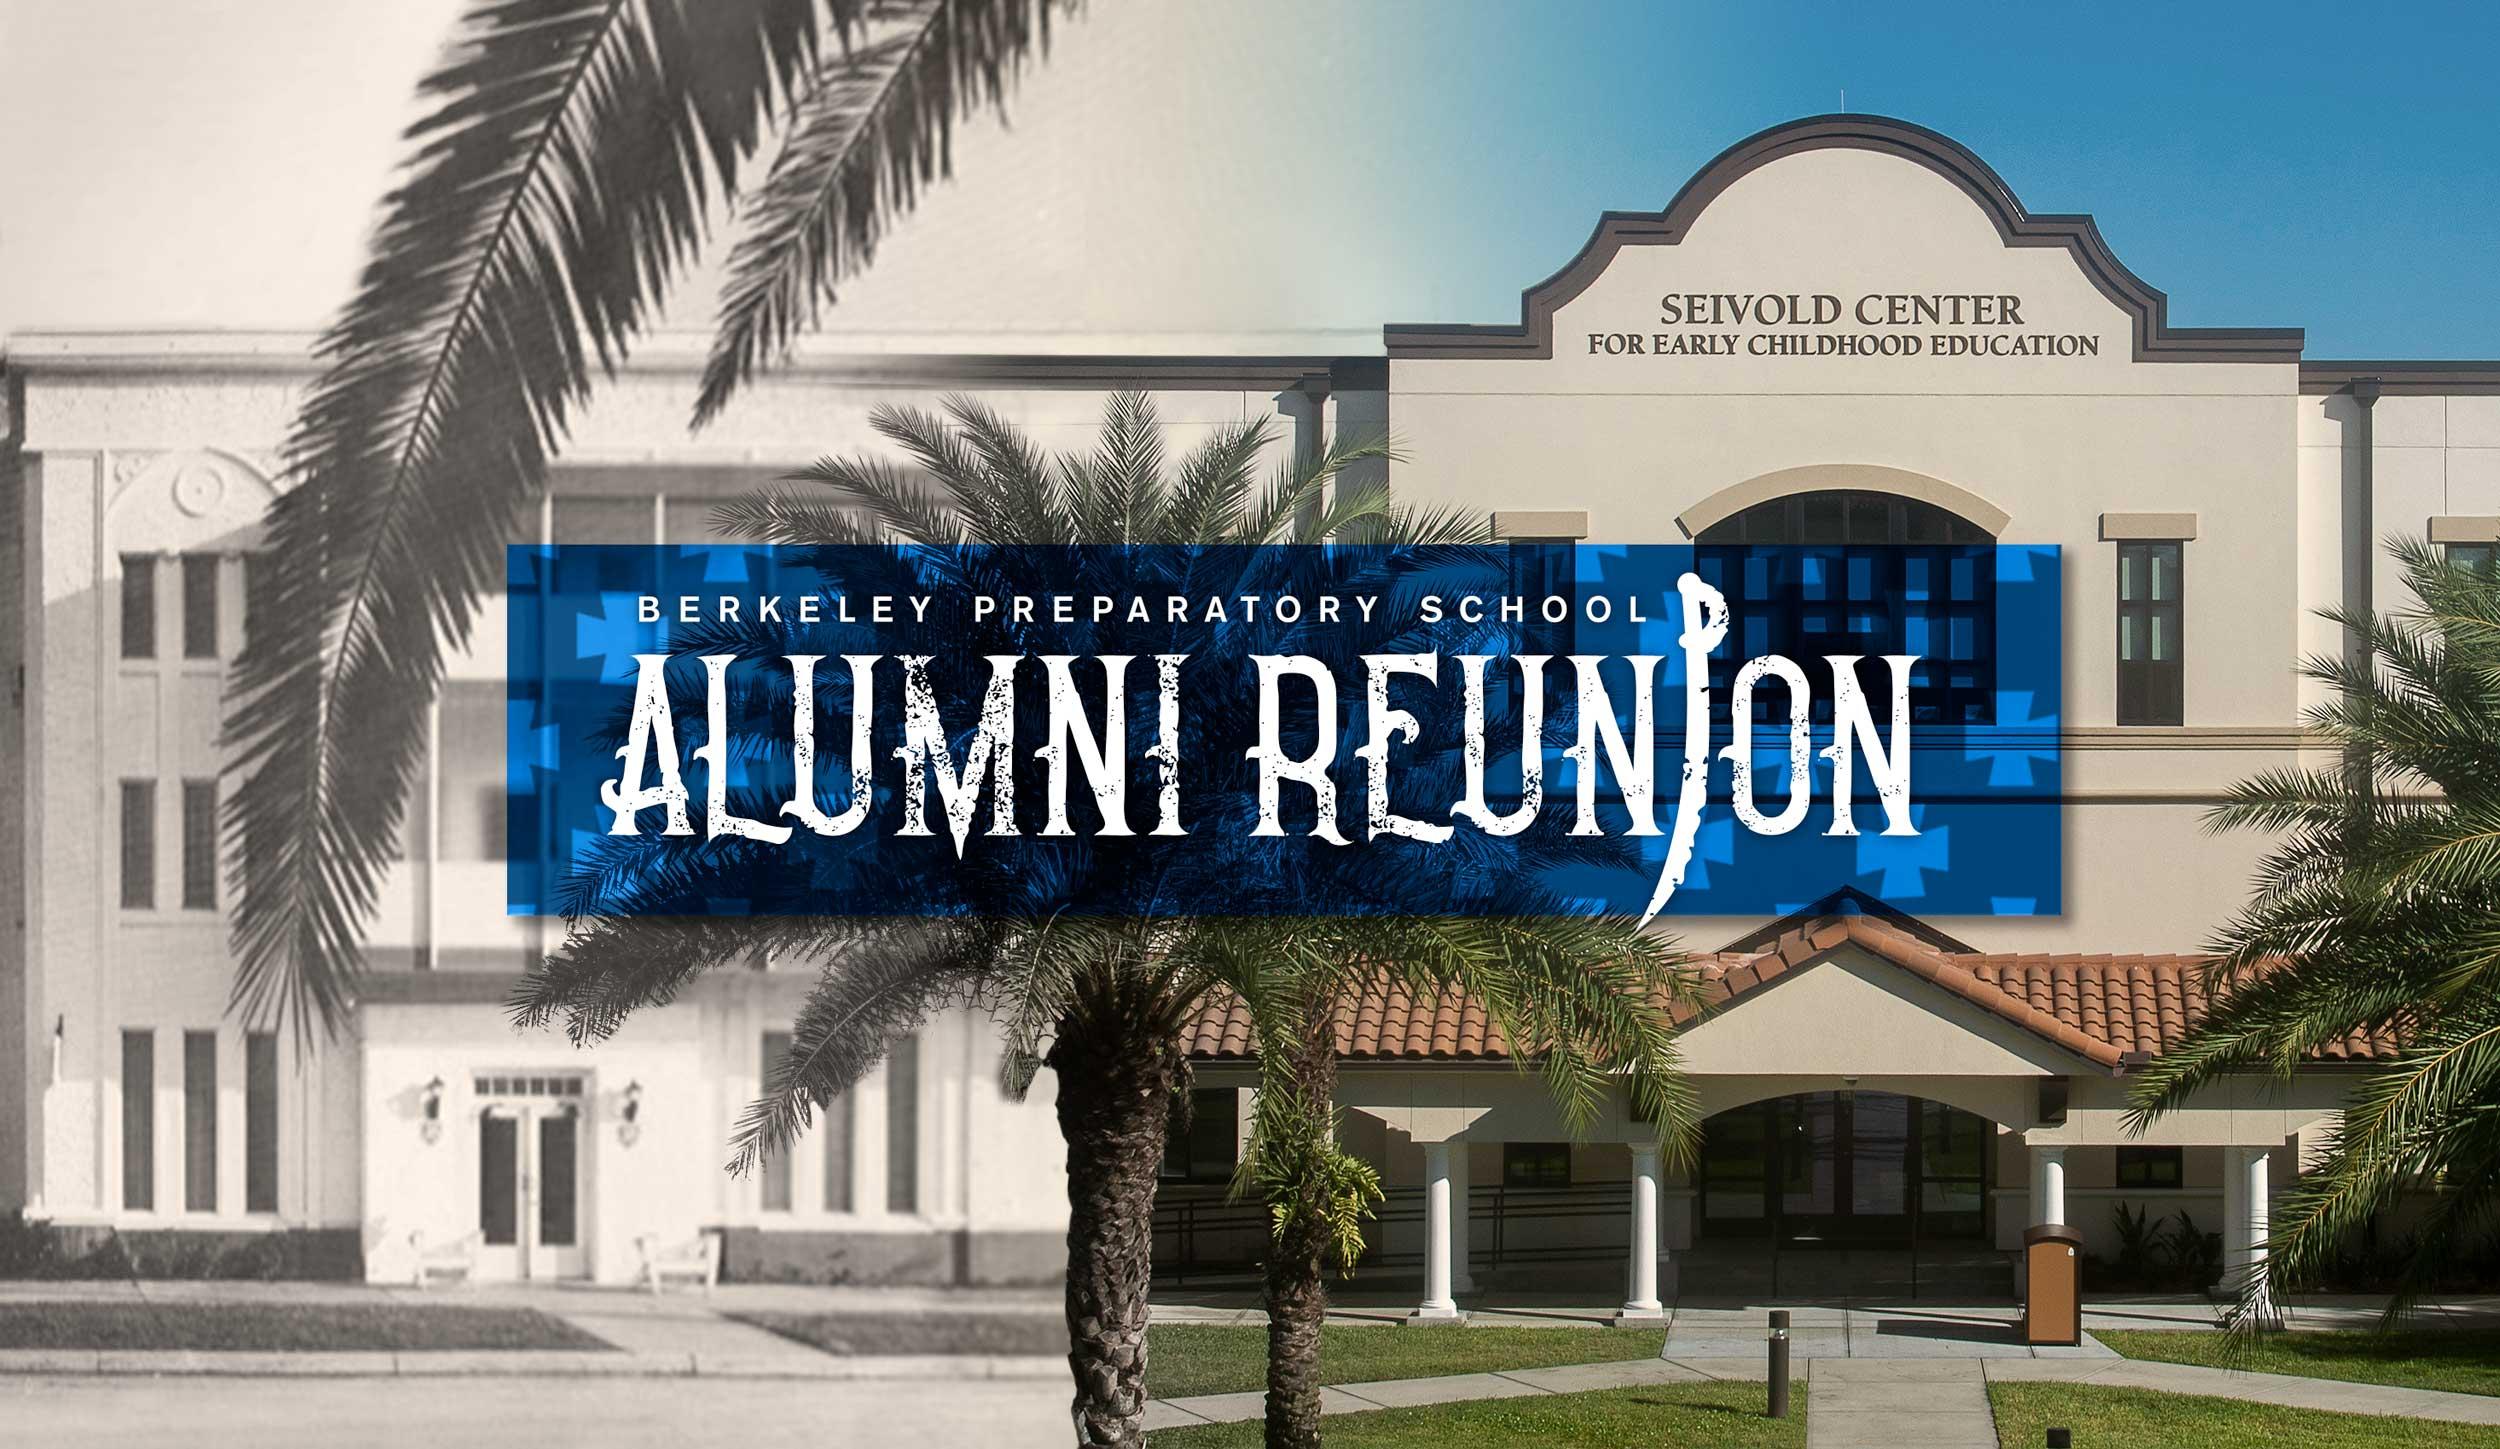 Alumni reunion branding